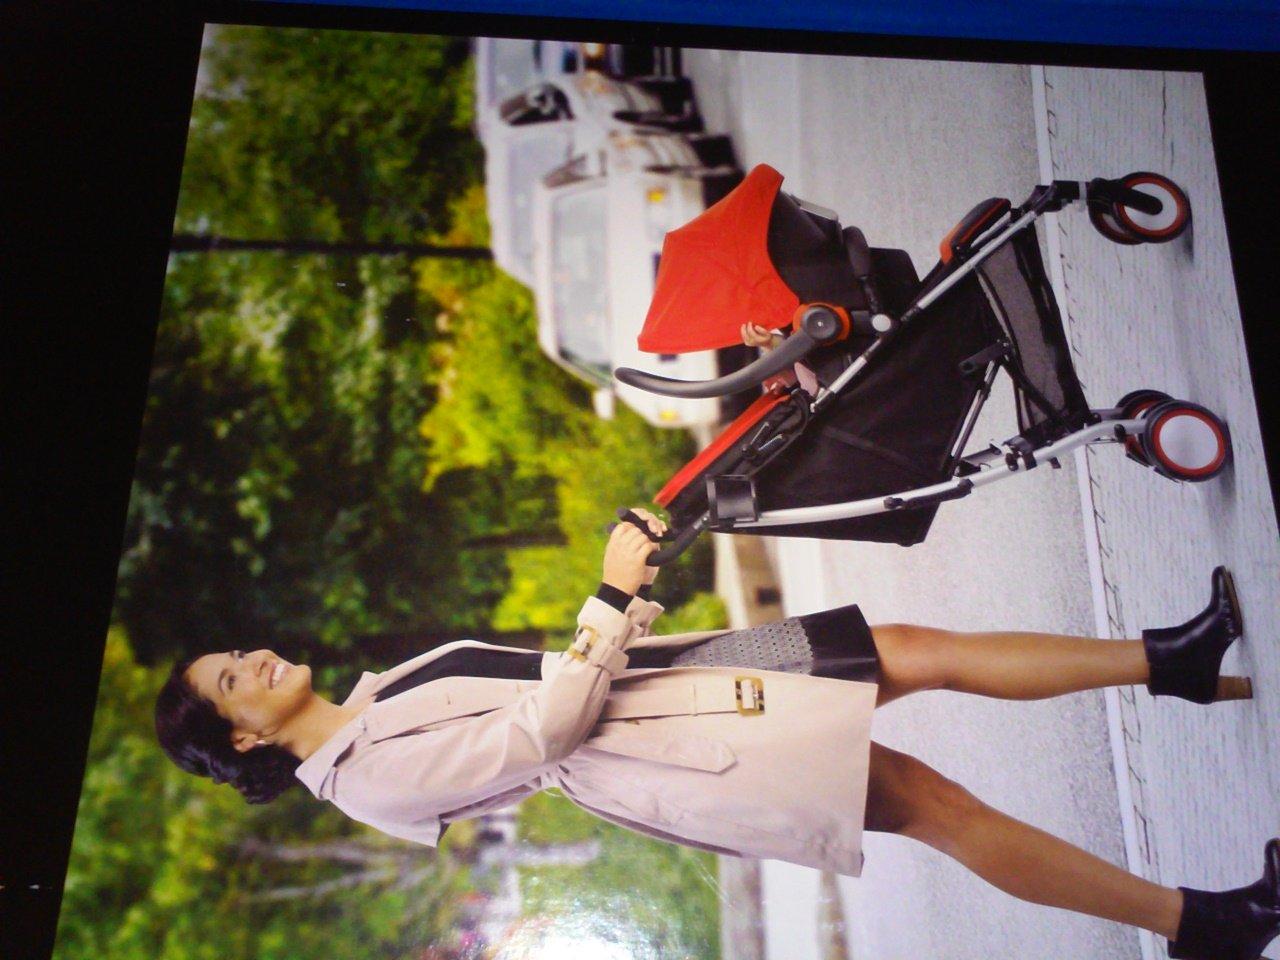 Amazon.com : Urbini Touri Travel System, Black, Model # 10ab1y-blku : Baby